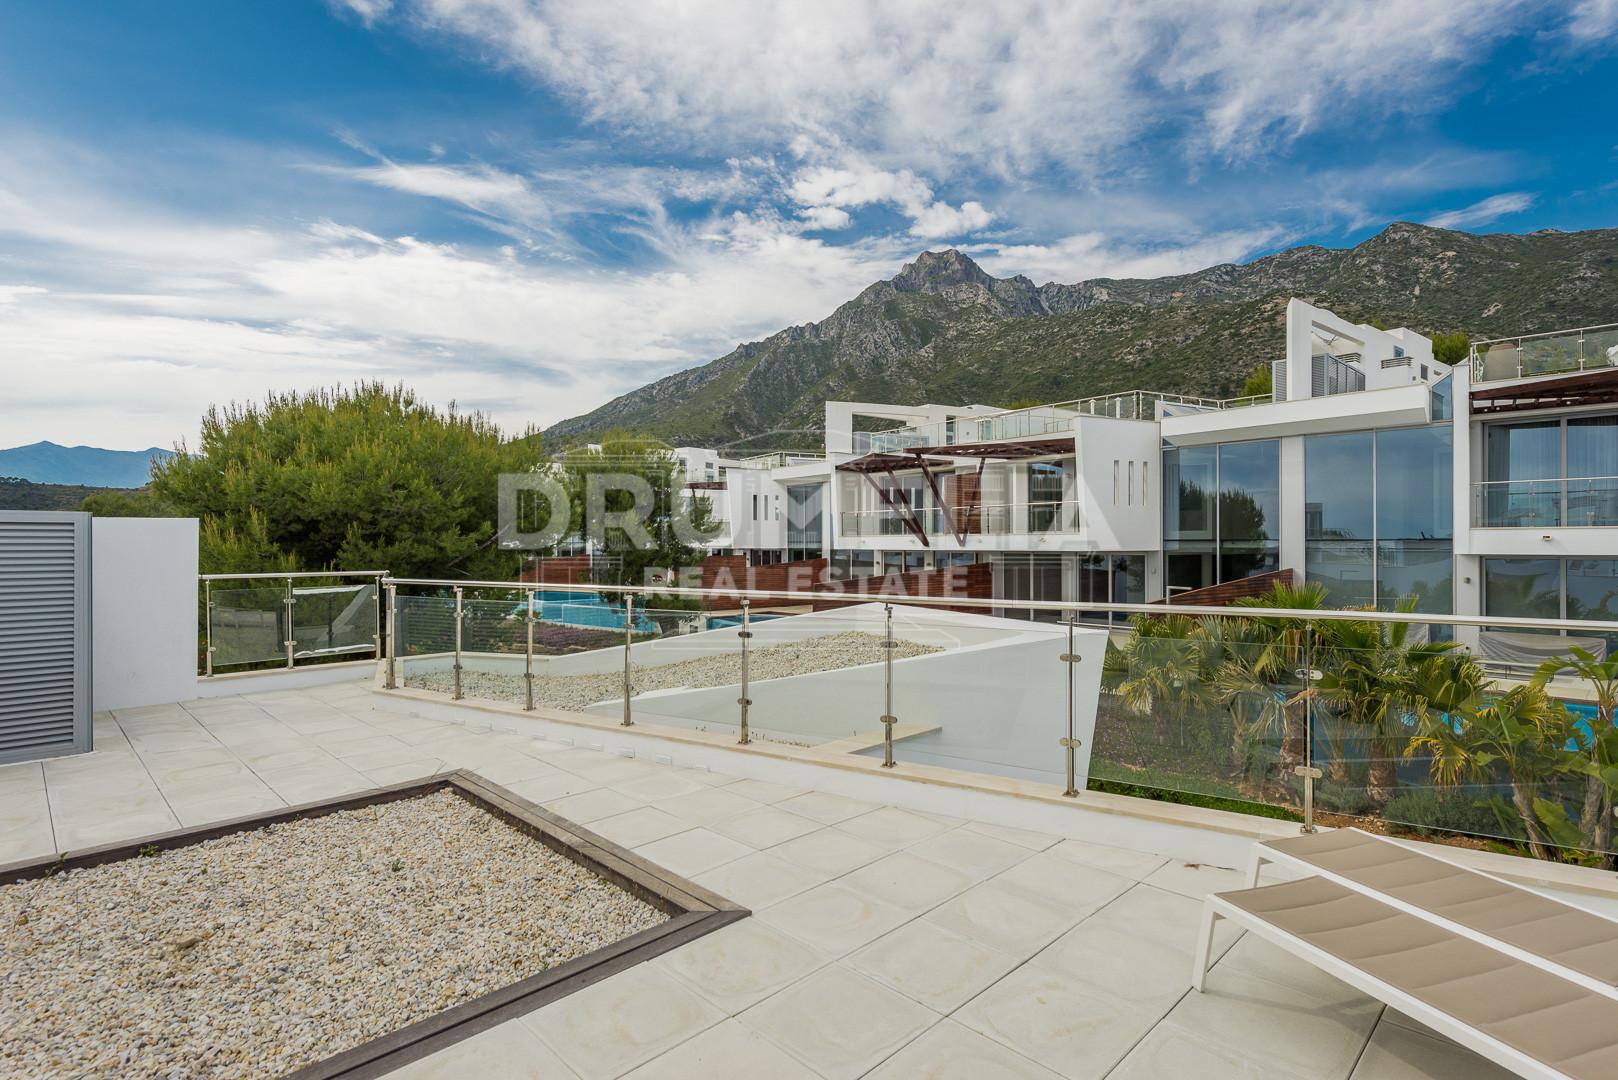 Pareada villa elegante moderna en sierra blanca milla de for Villa elegante